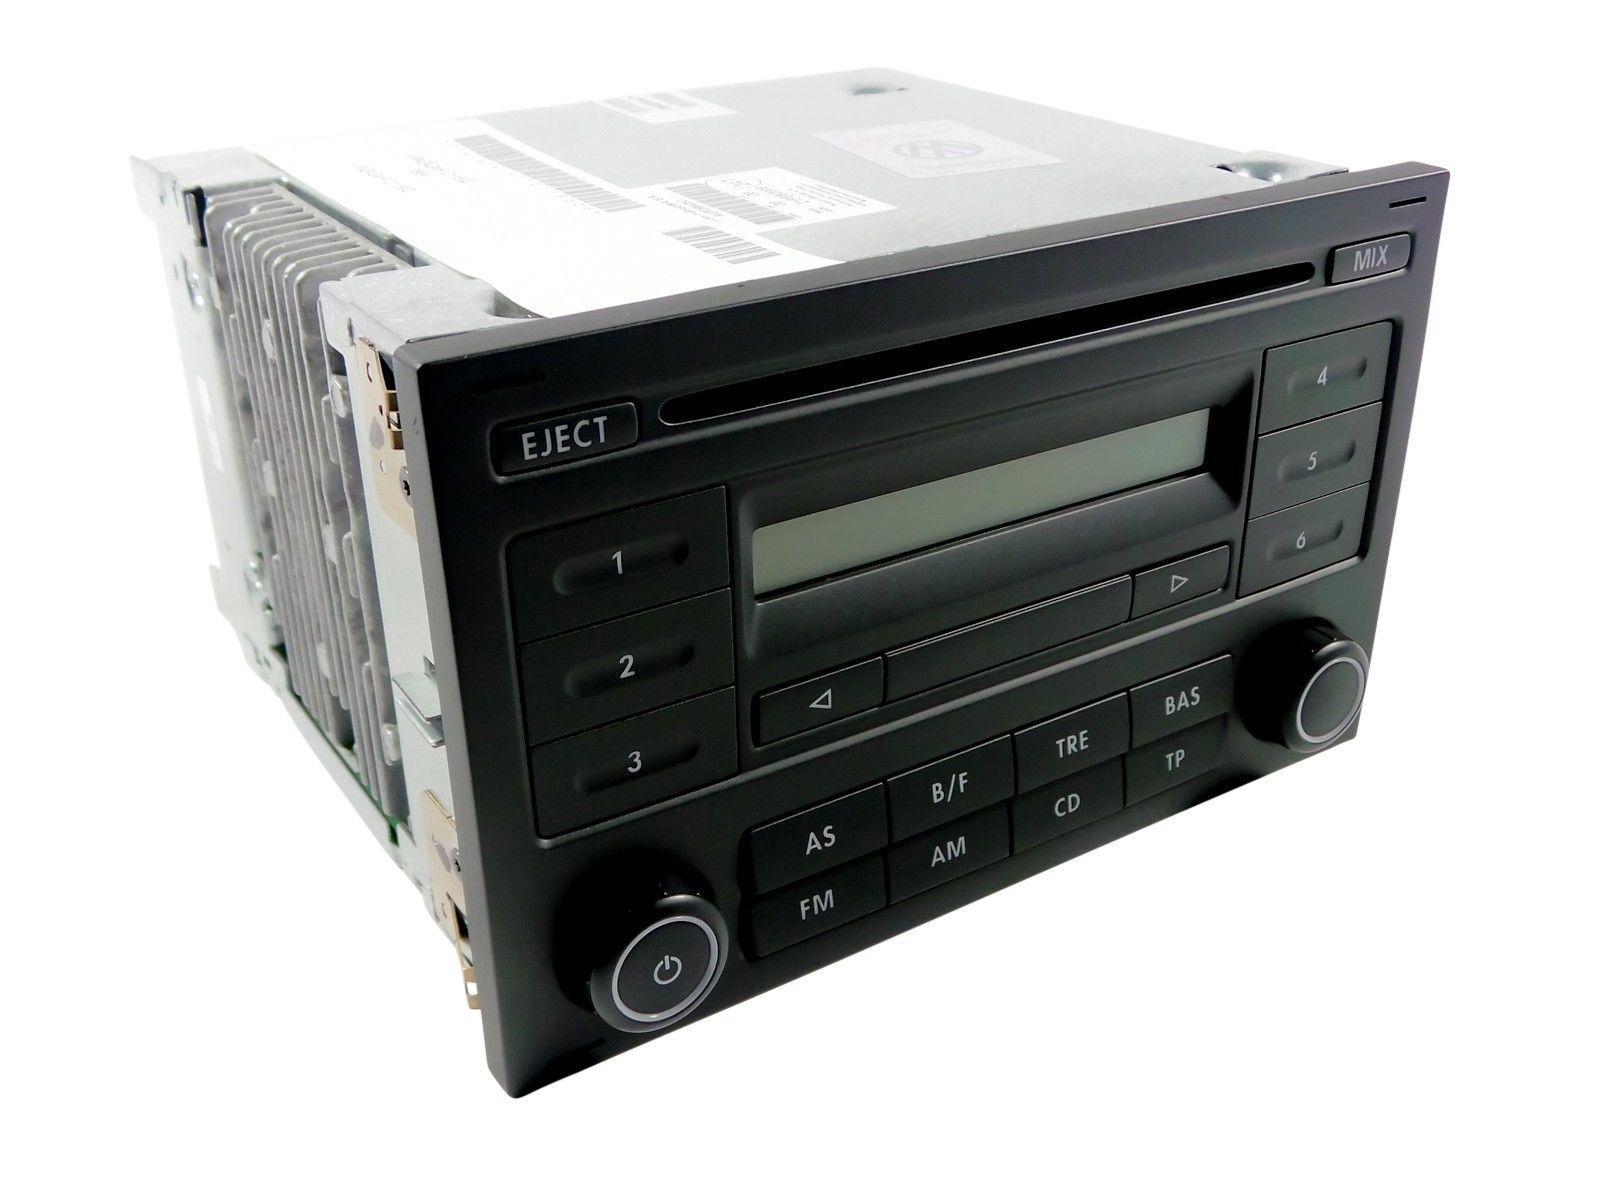 VW Polo 9N 9N3 Golf IV Sharan Passat 3BG T4 Autoradio CD Radio RCD 200 Neu/OVP